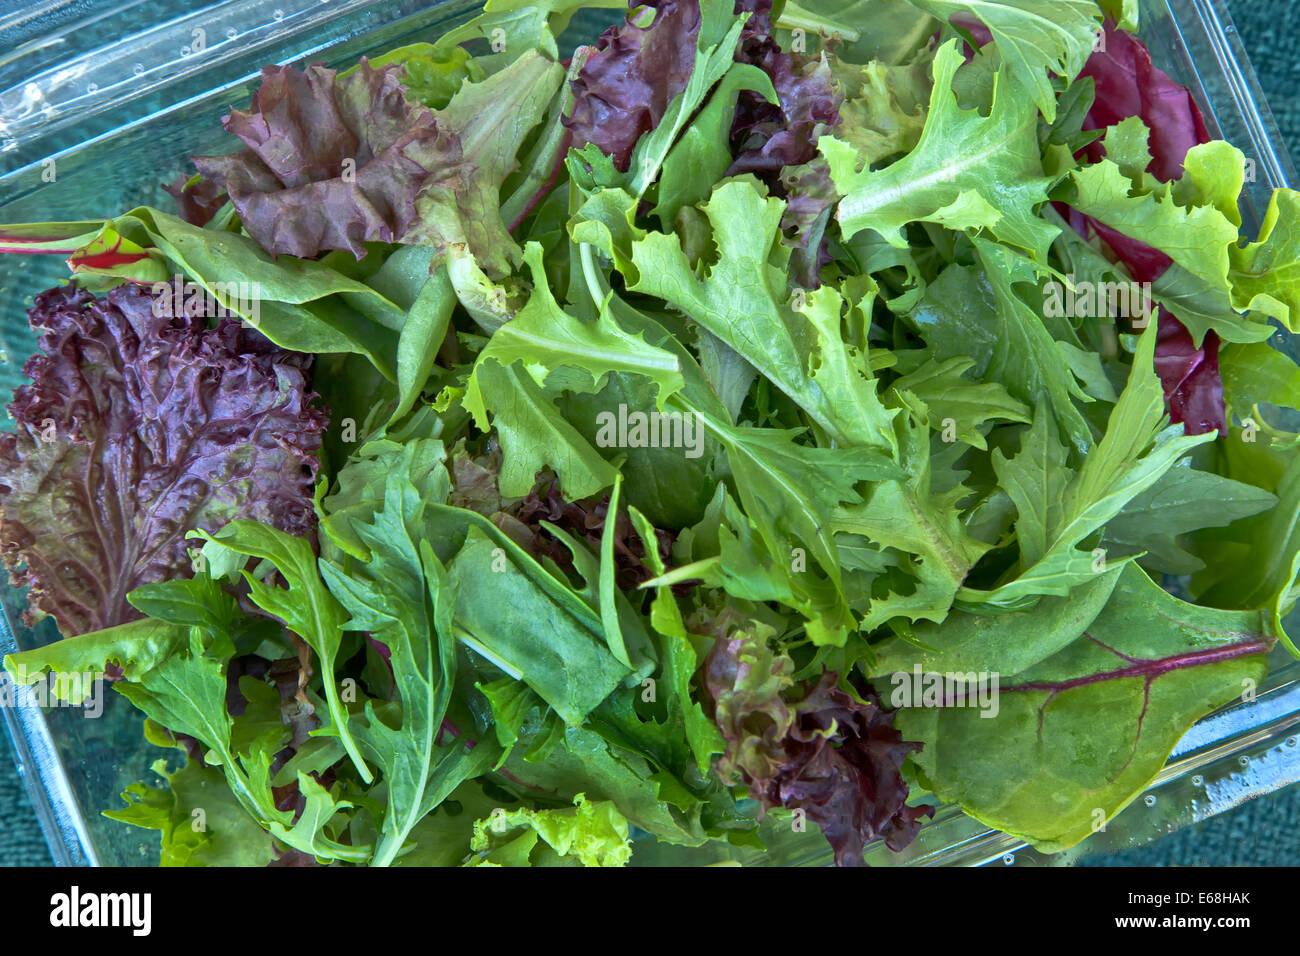 Organic baby lechuga' ensalada de primavera mix. Imagen De Stock